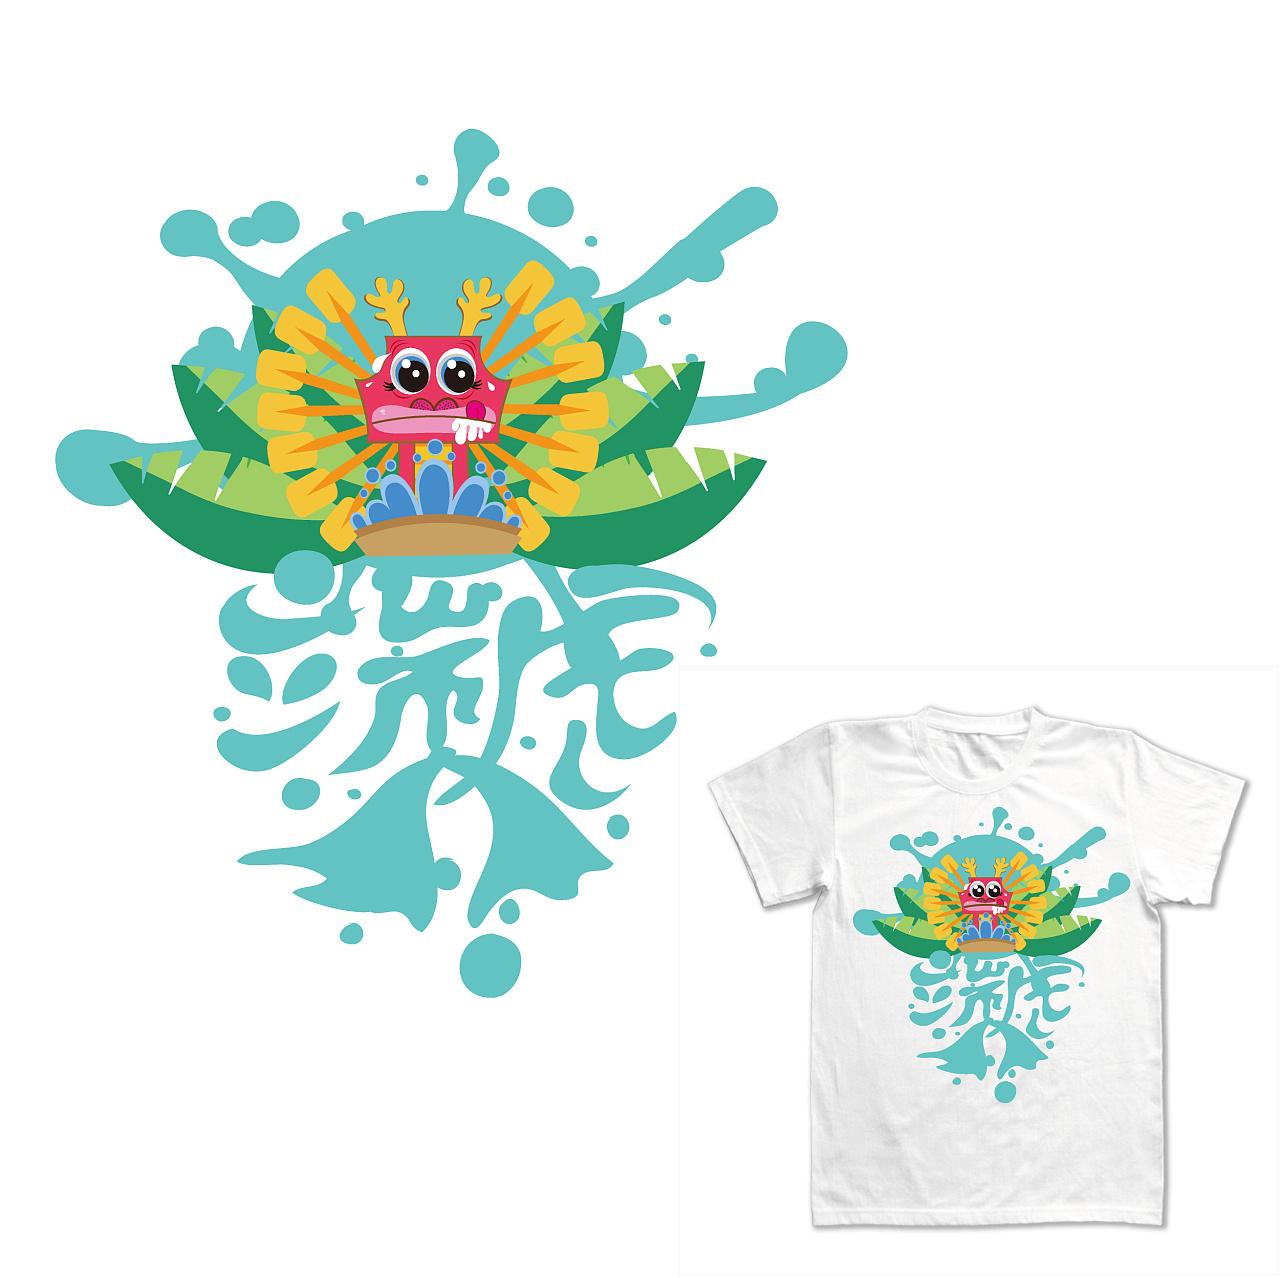 t恤图案设计传统文化元素的运用